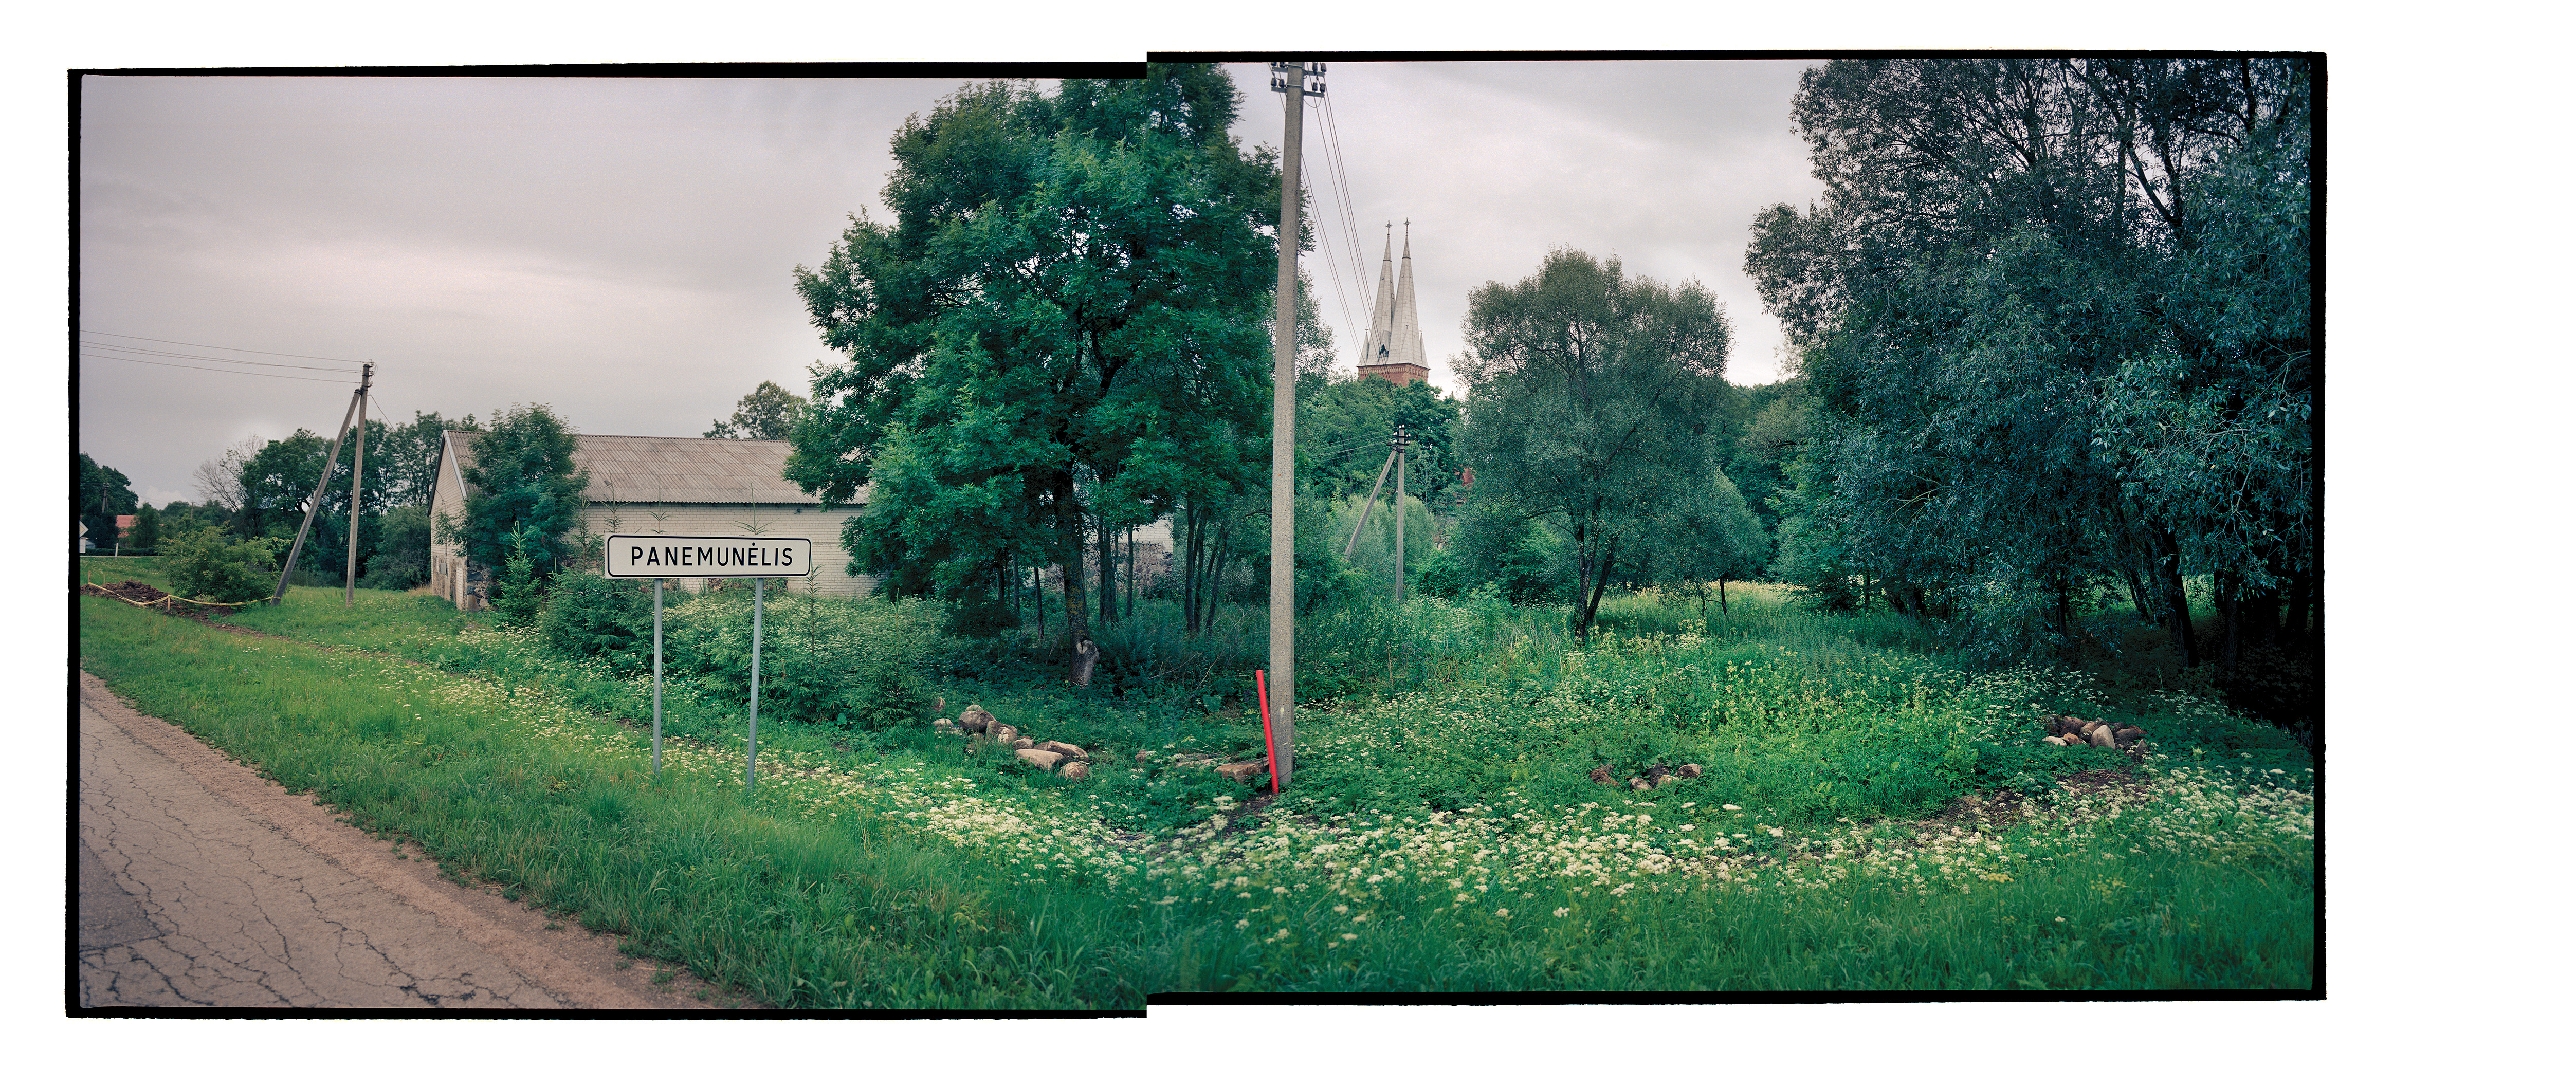 Road to Matilda Olkin's hometown